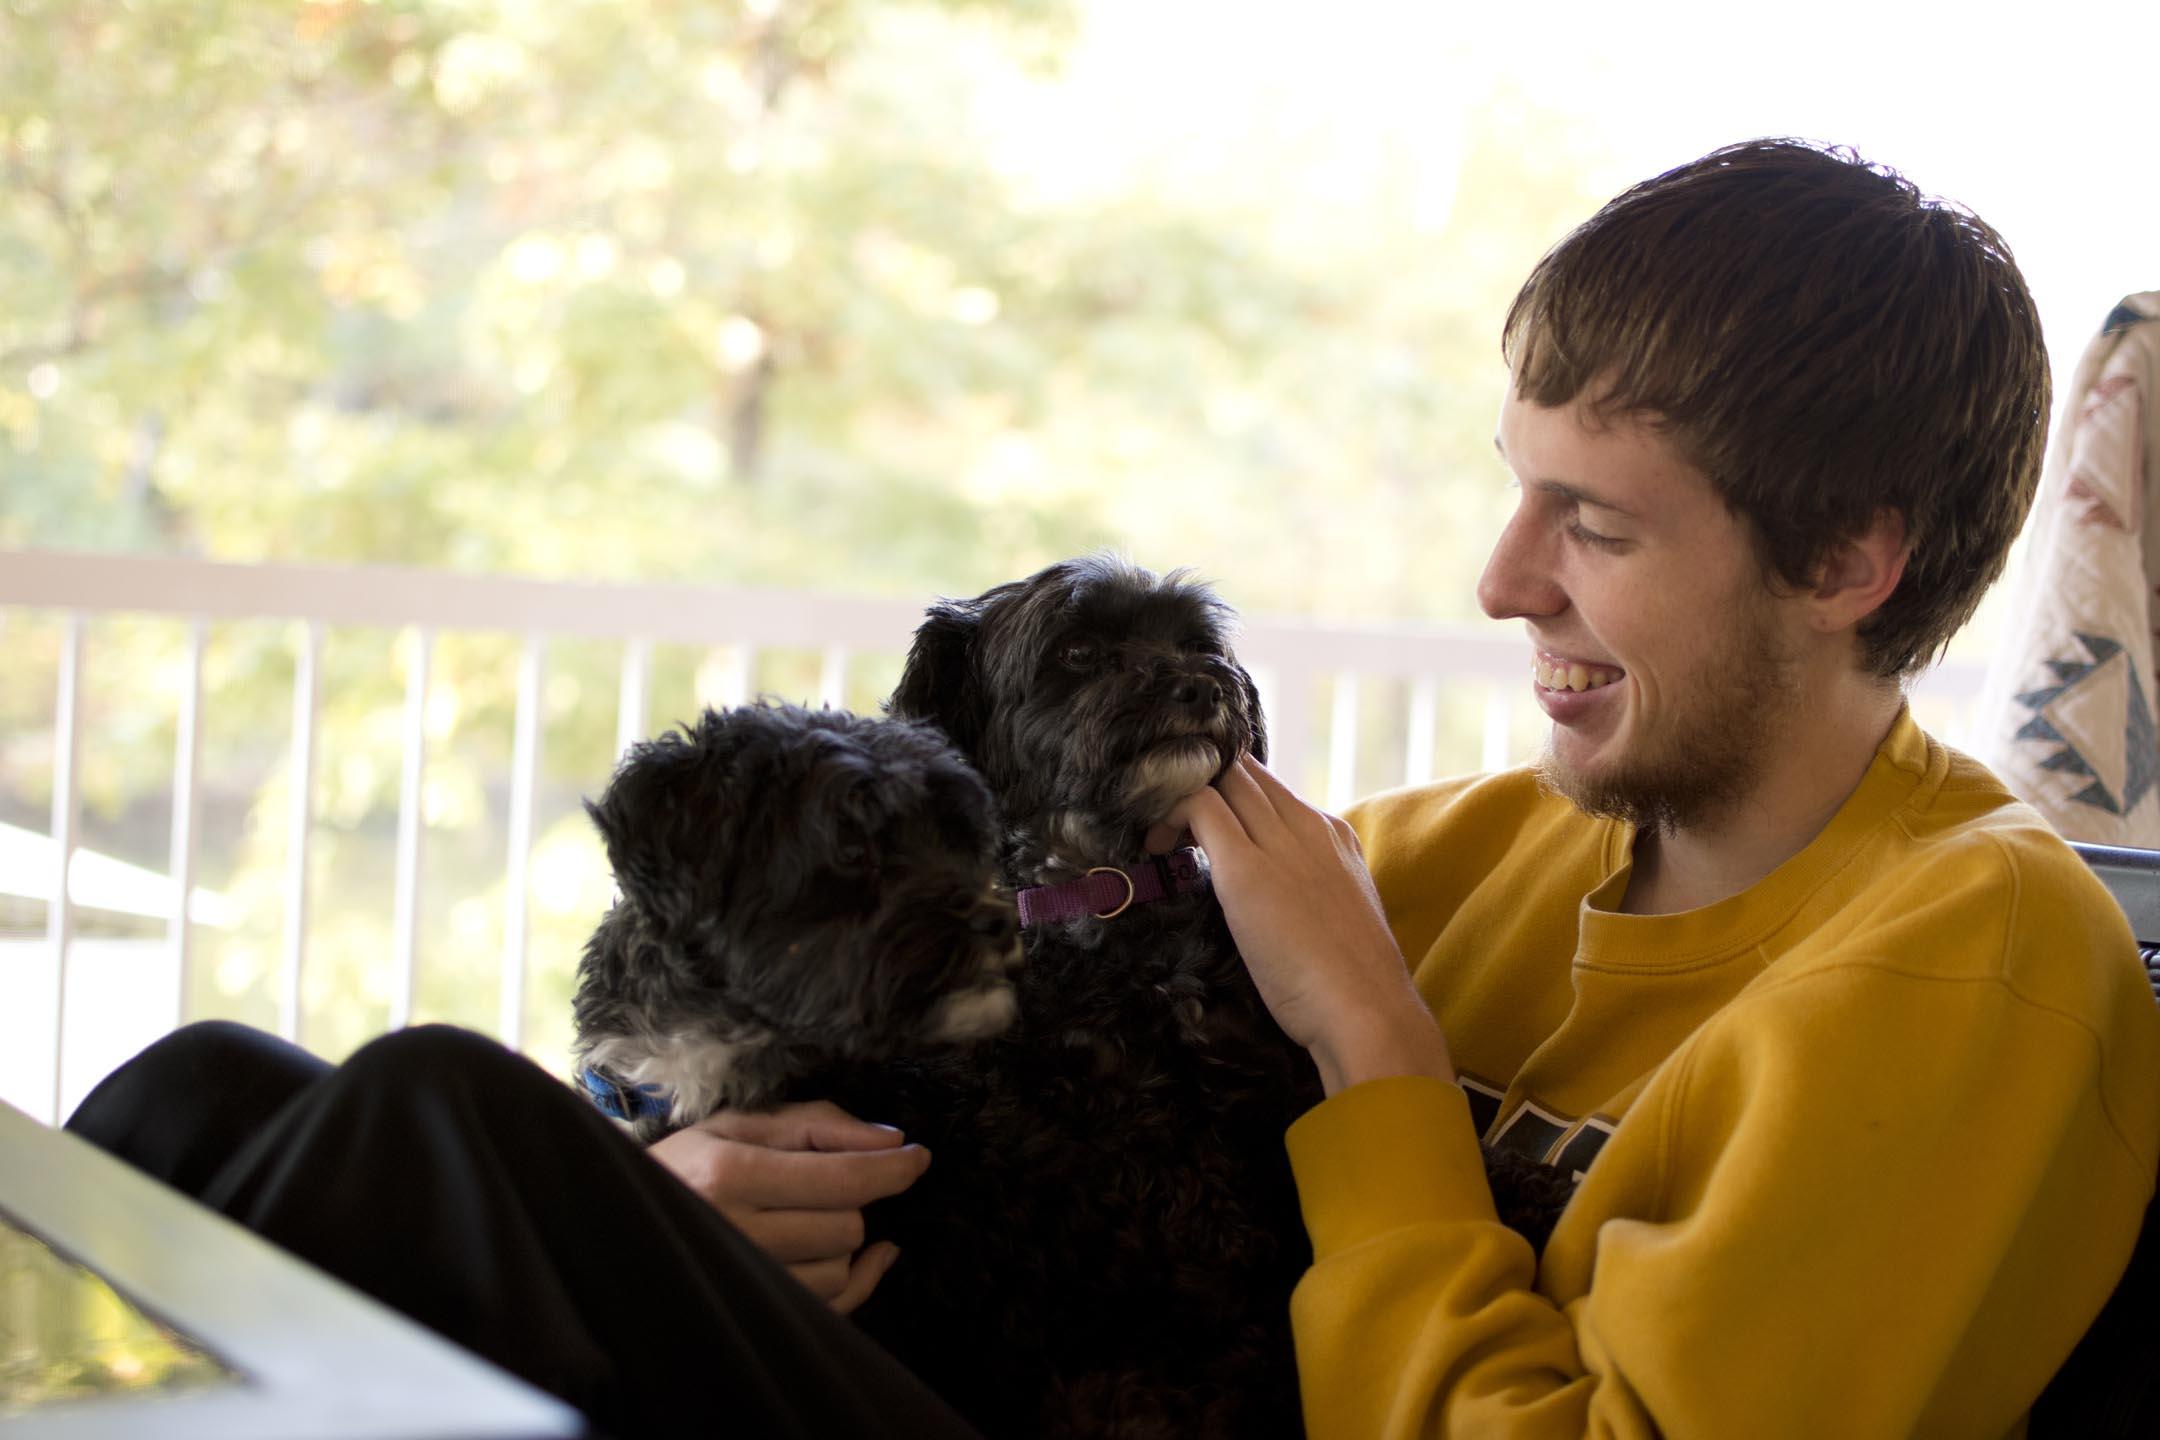 brett+puppies4_lakehouse_10-10-15.jpg